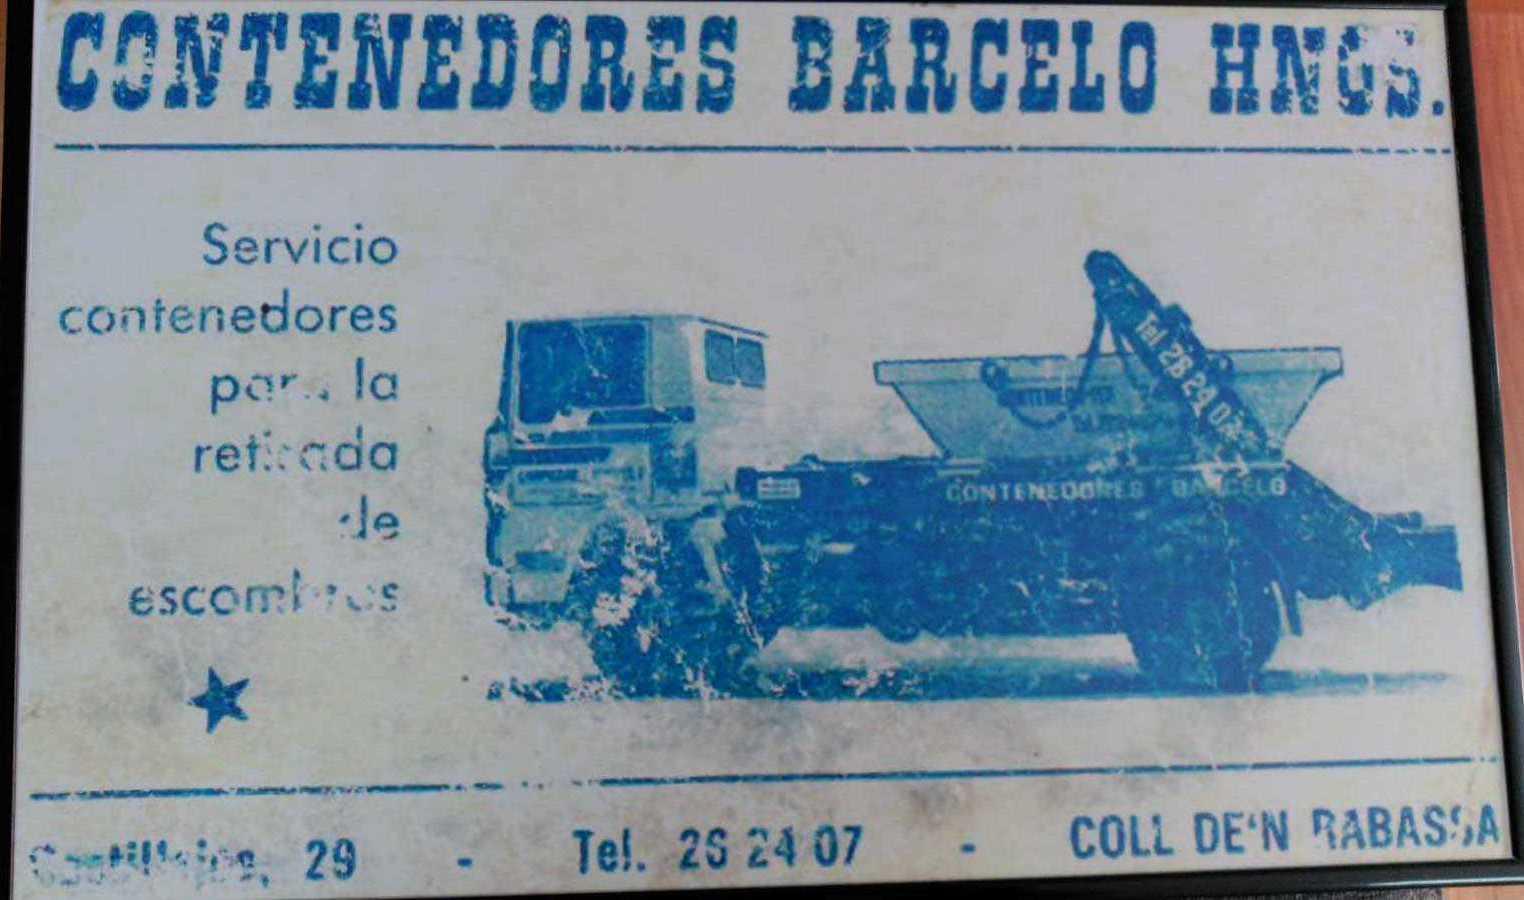 Foto 21 de Alquiler de contenedores en Palma | Contenedores Barceló